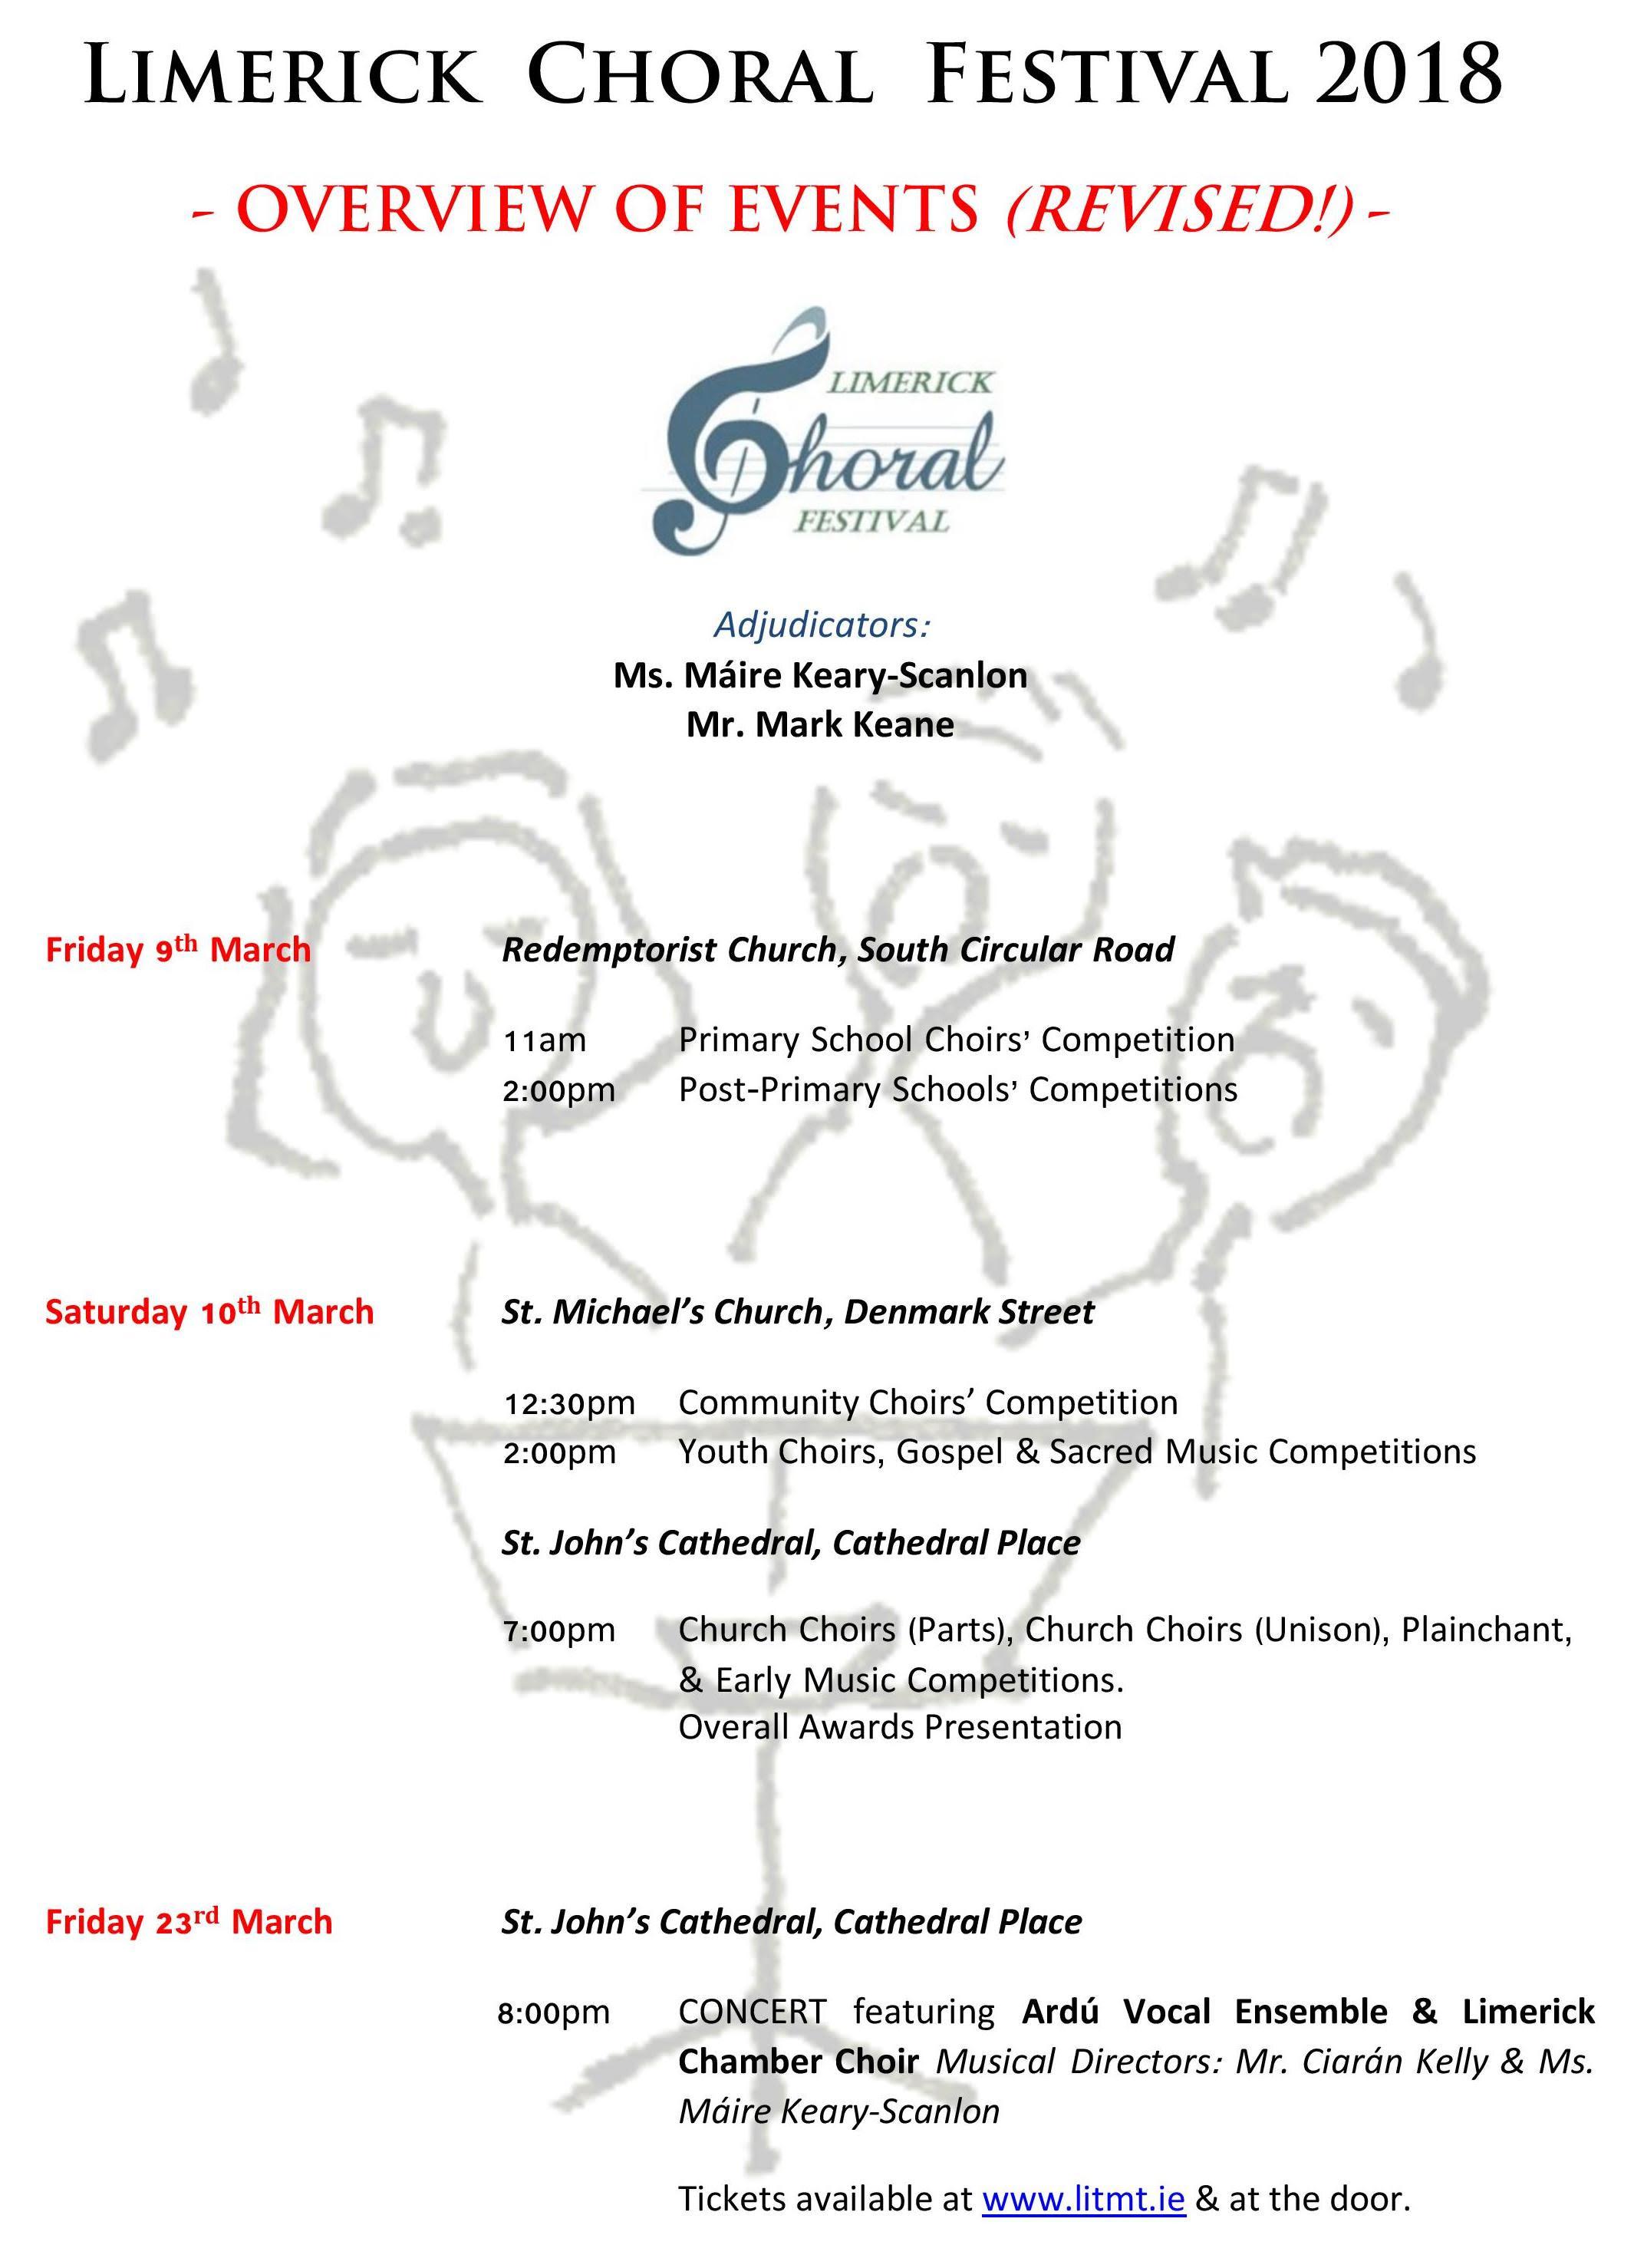 Limerick Choral Festival 2018